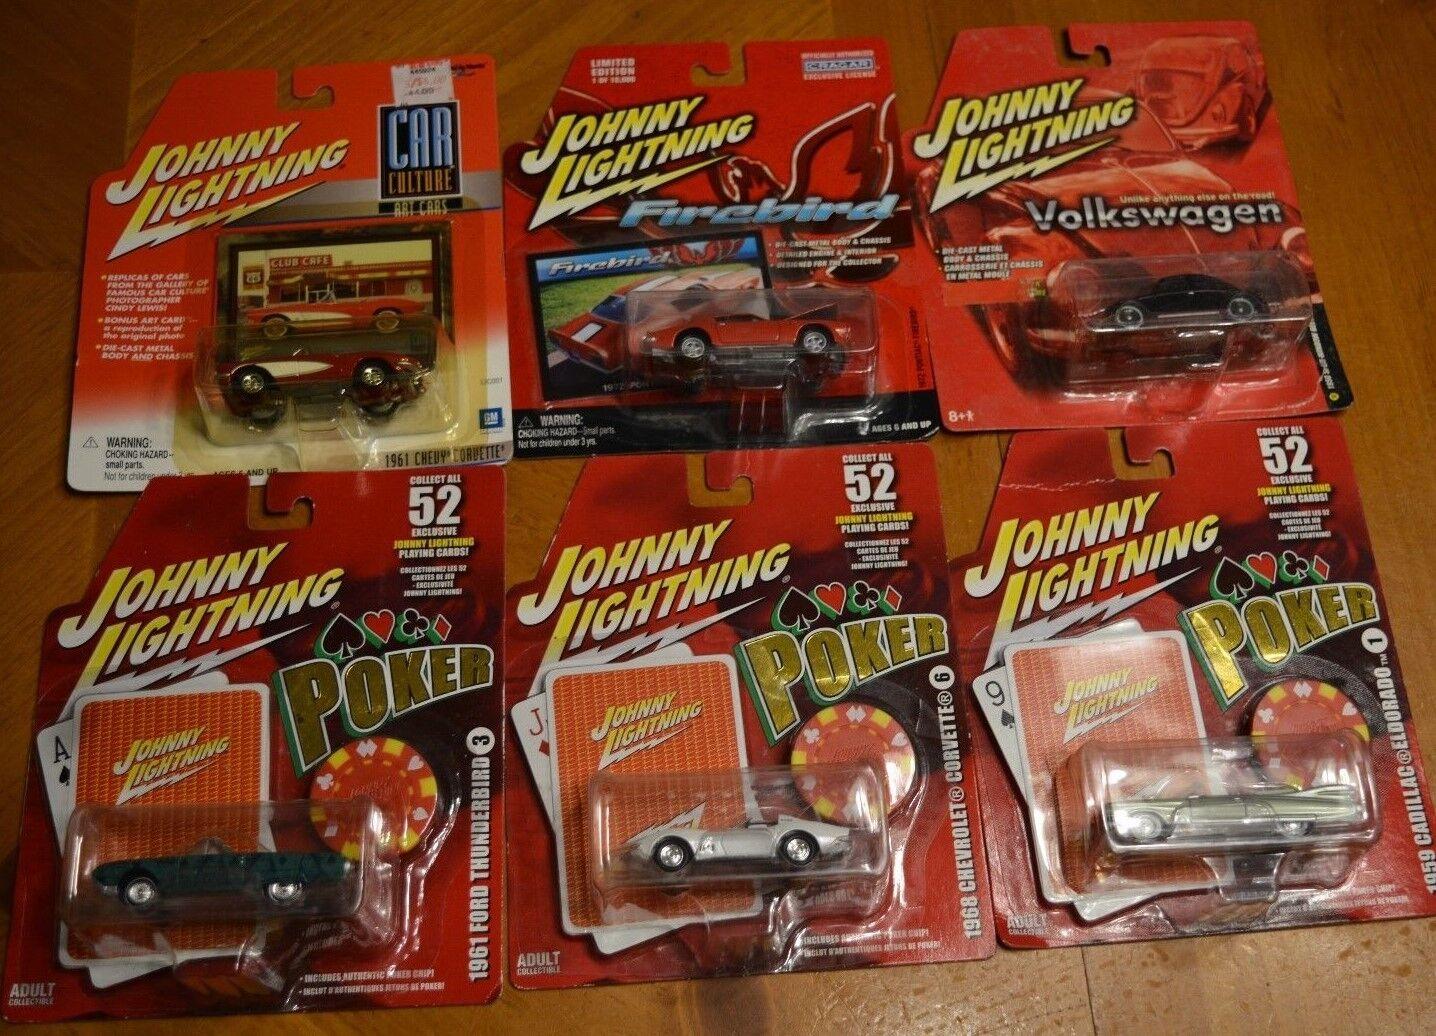 Johnny Lightning Deal ACHETEZ 5 OBTENEZ 1 GRATUIT  Poker, Firebird, CORVETTE, VW, Eldorado